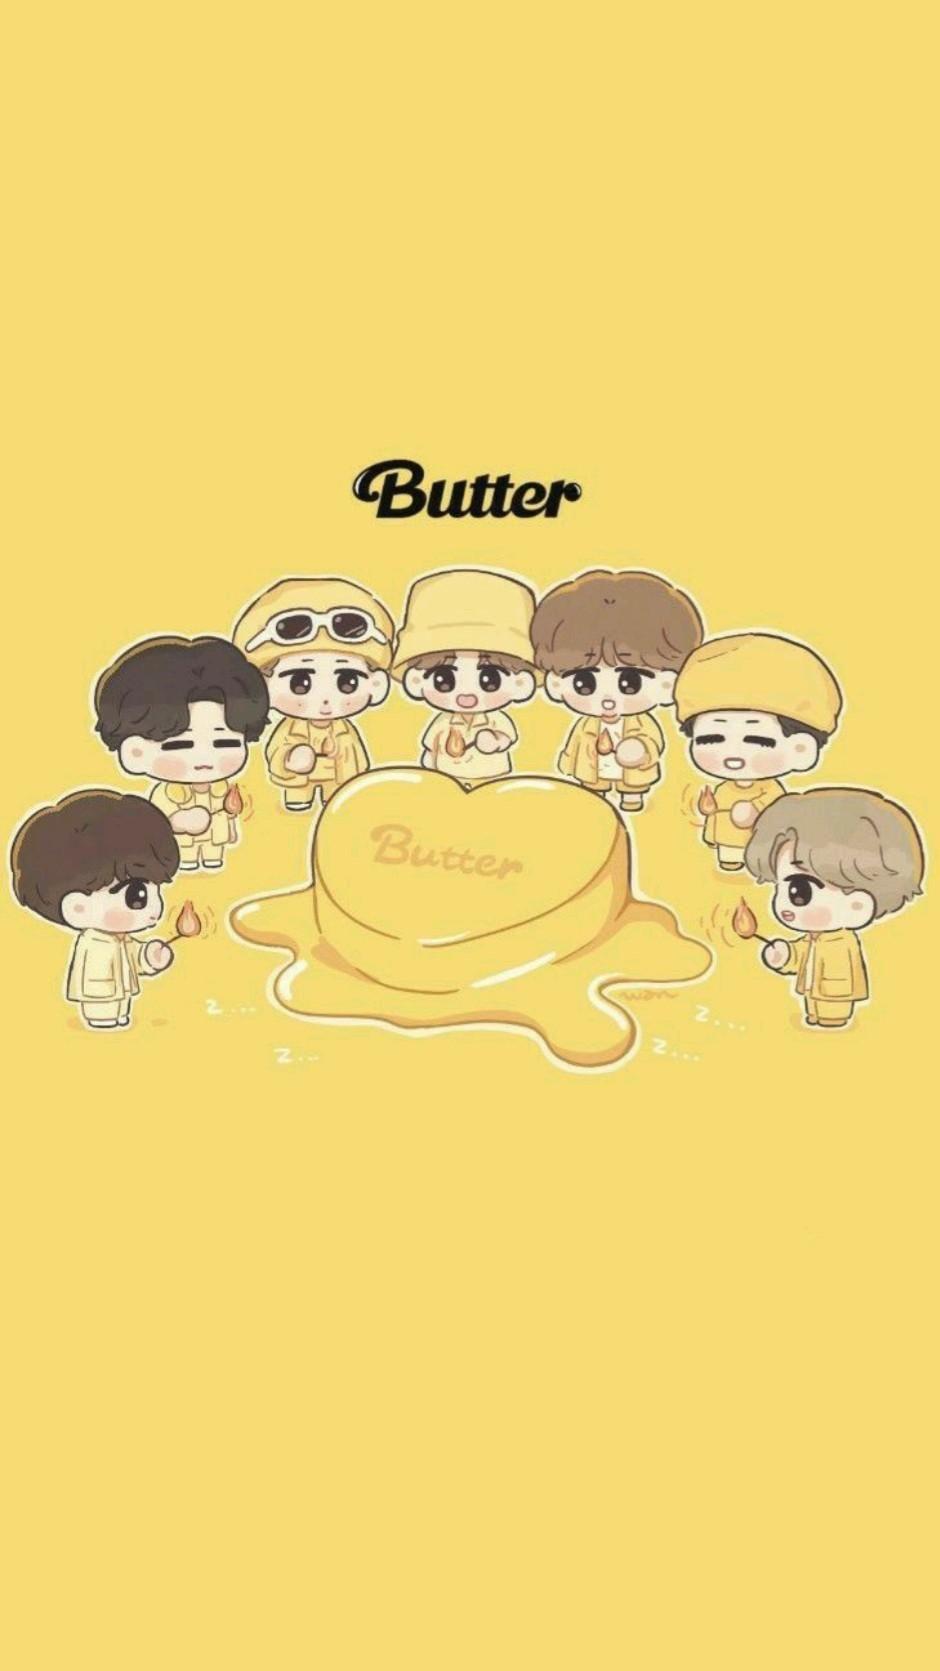 Pin On ستوريات Bts wallpaper hd butter